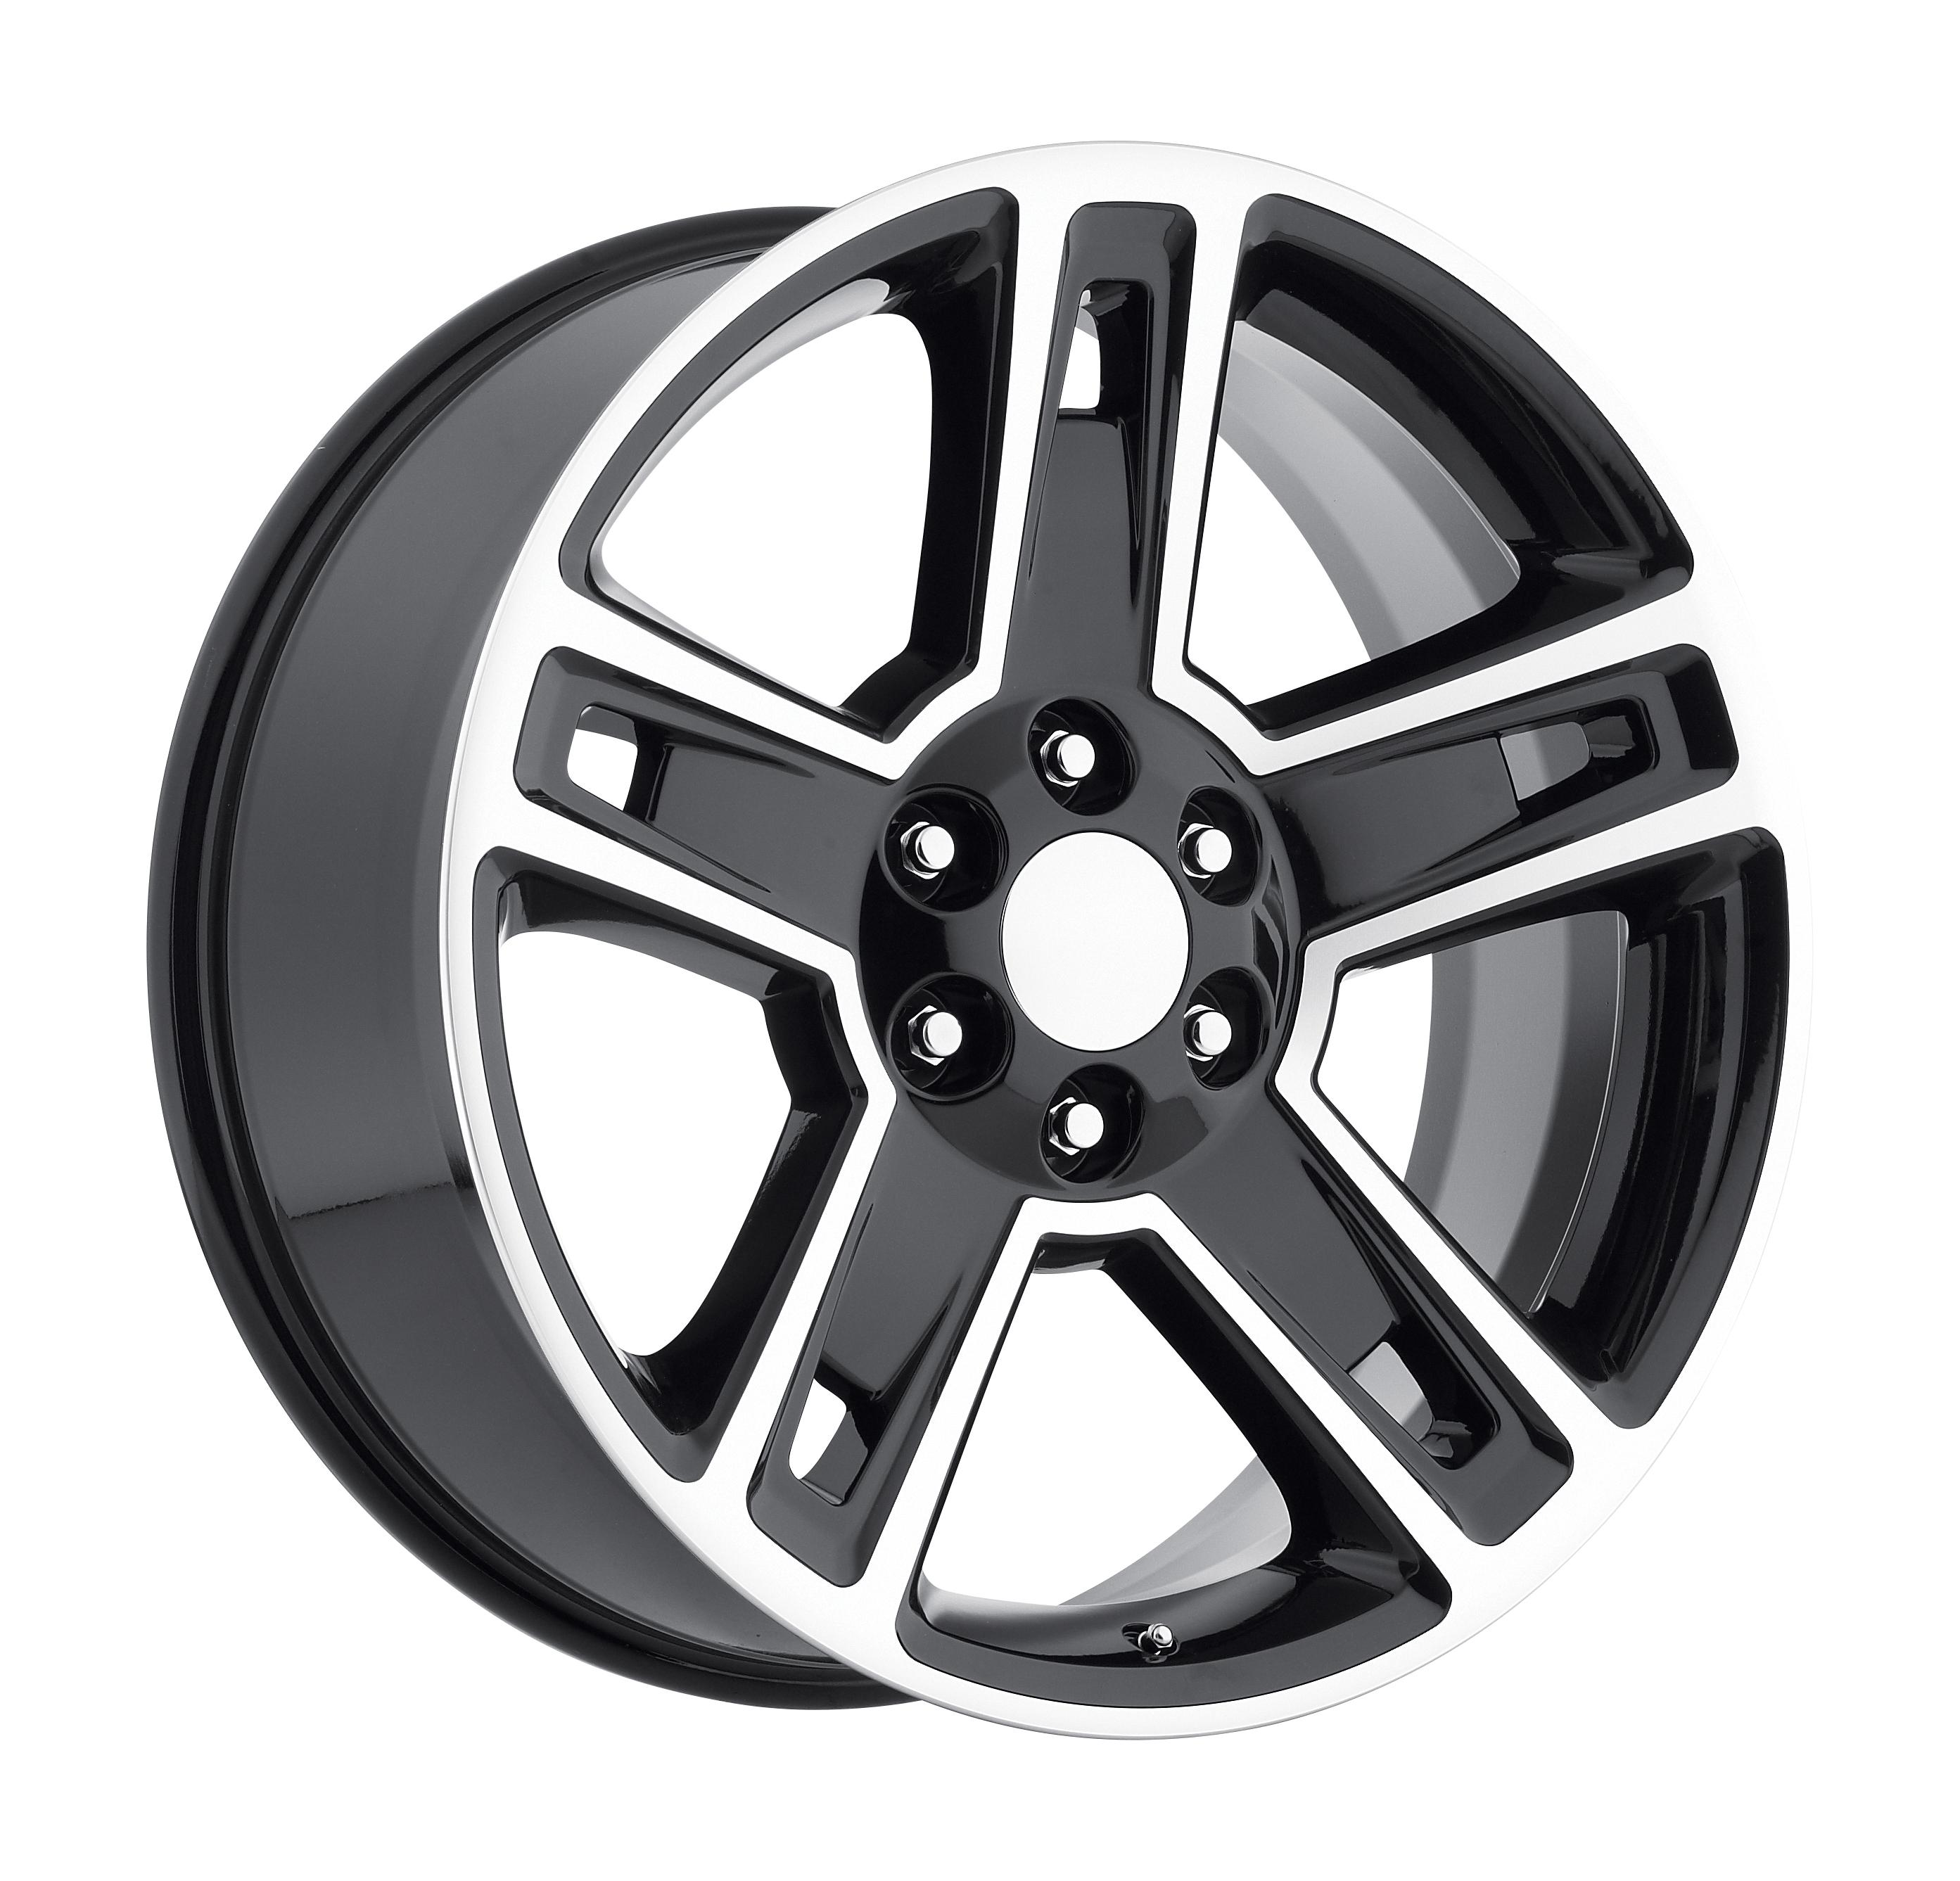 2015 Chevrolet Silverado 1500 Black Machined Face Replicas Wheels